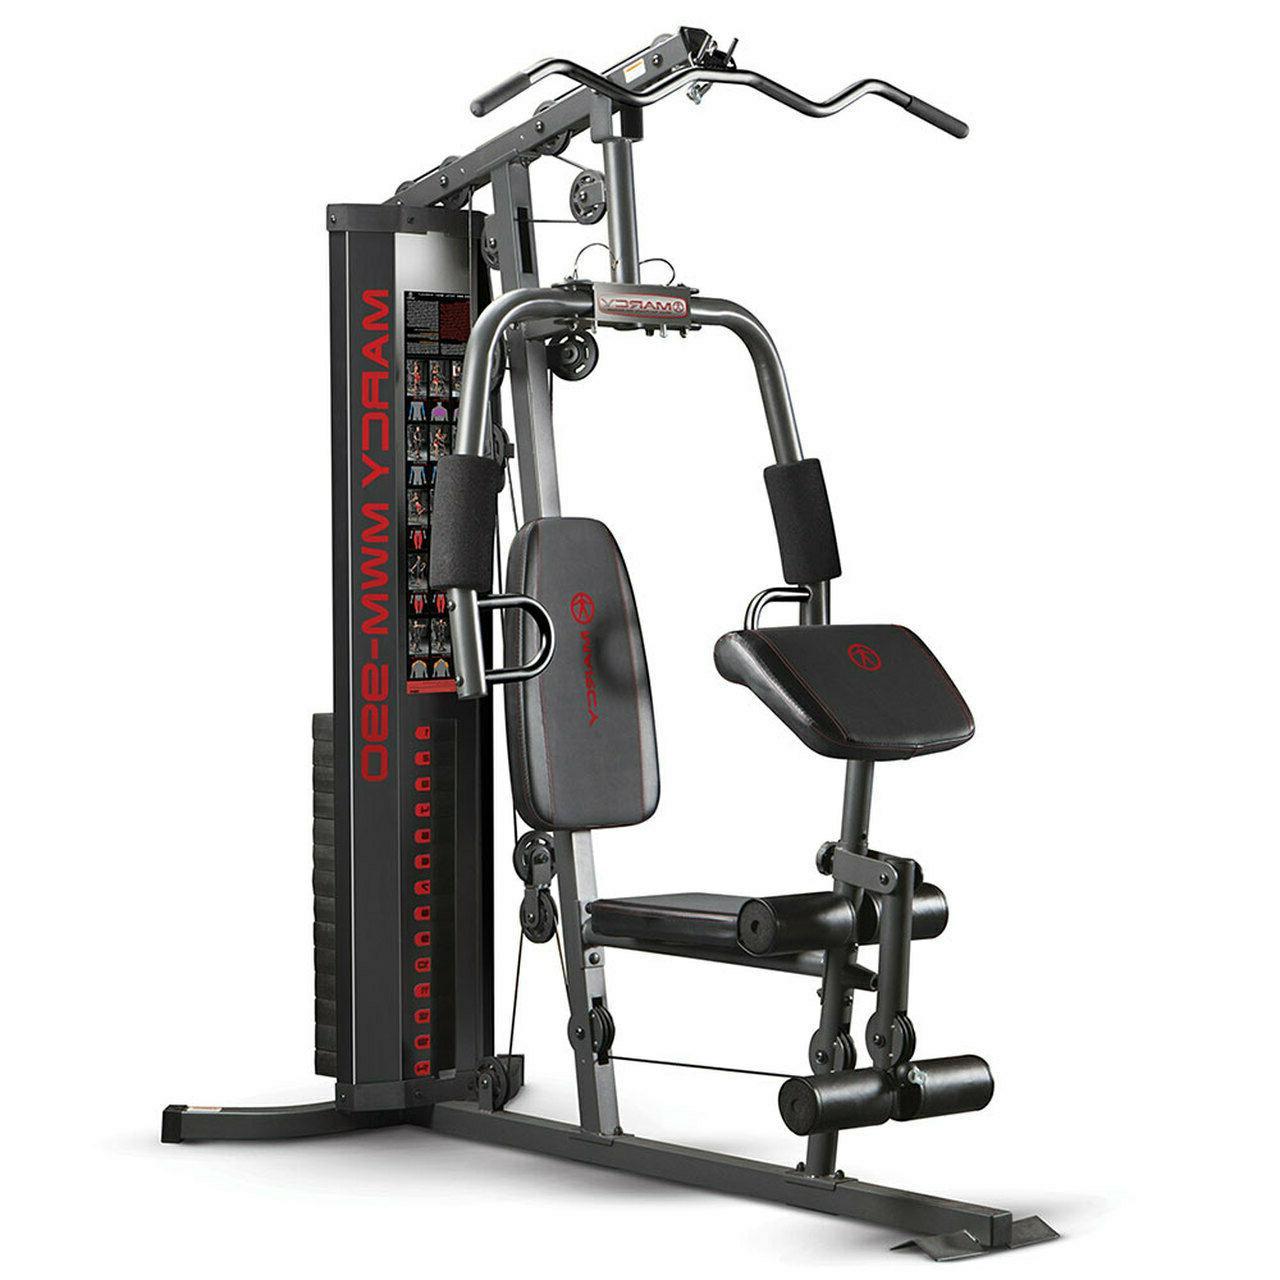 Marcy Home | MWM-990 Adjustable Weight Machine